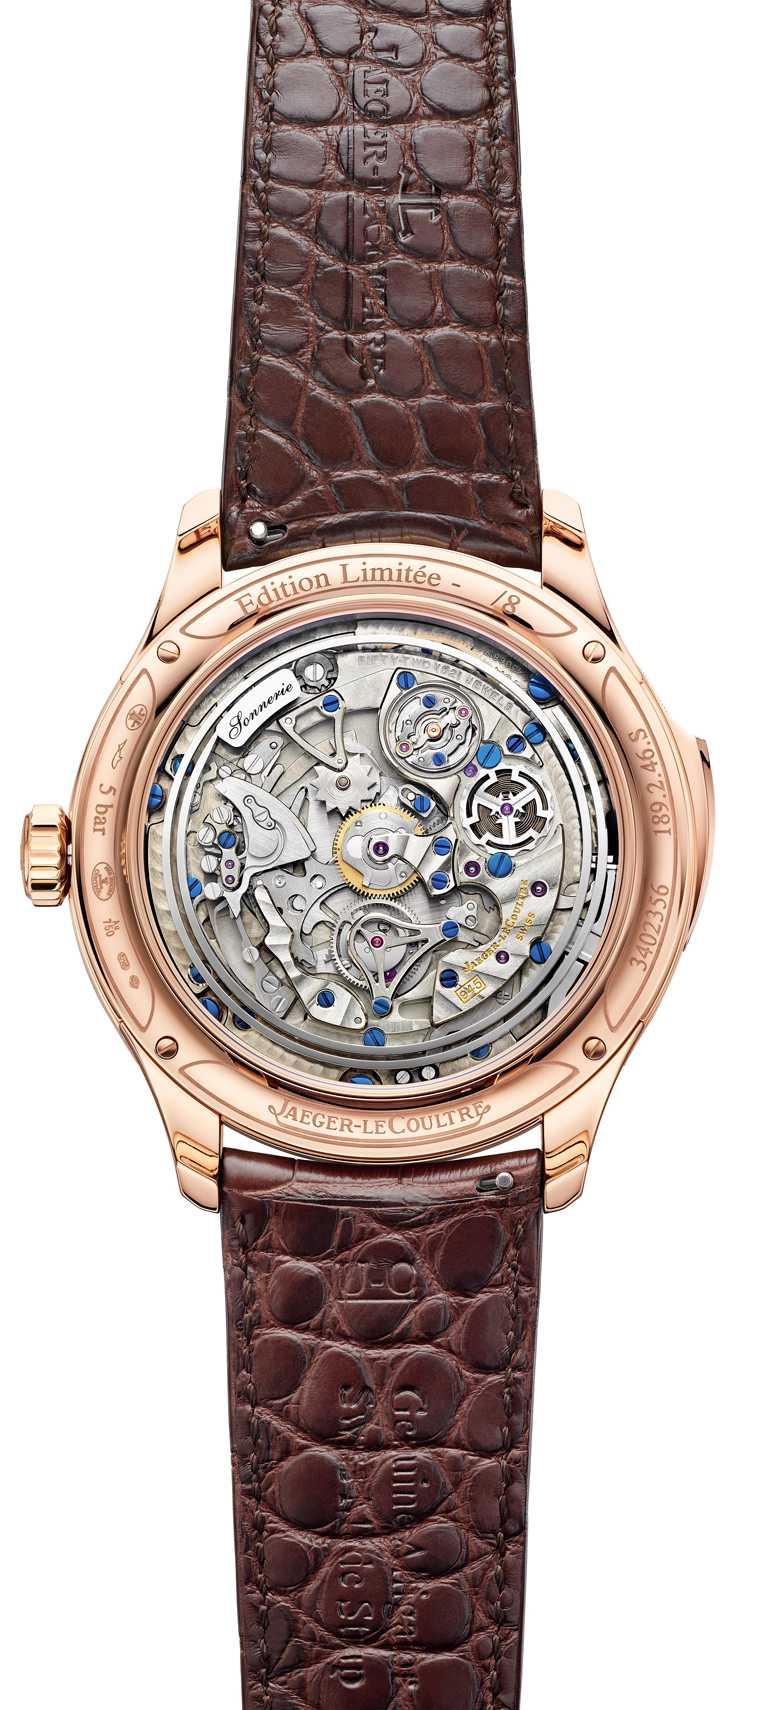 JAEGER-LECOULTRE「Master Grande Tradition超卓傳統大師系列」腕錶╱玫瑰金錶殼,45mm,限量8只╱11,700,000元。(圖╱JAEGER-LECOULTRE提供)